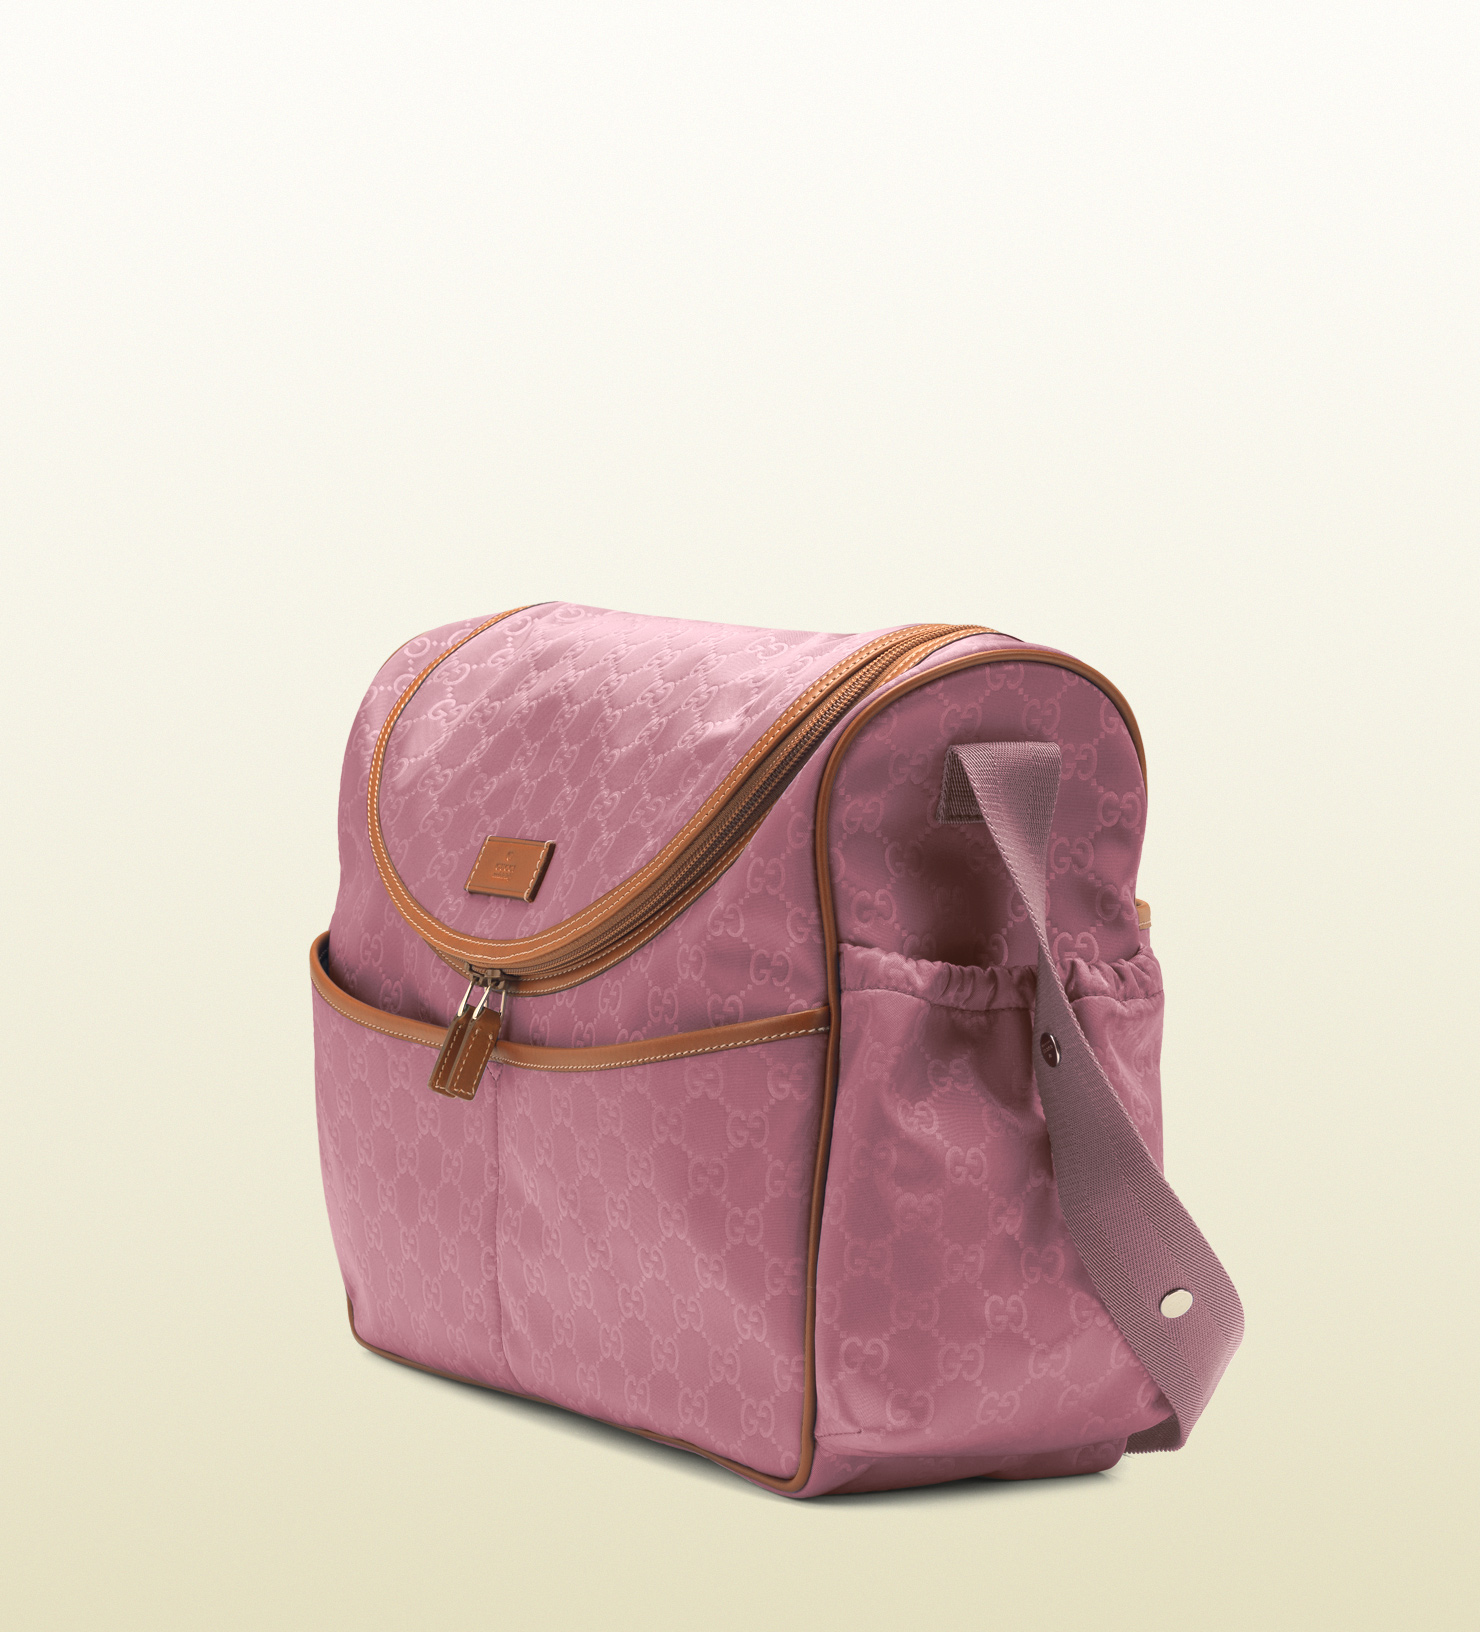 Gucci Dark Pink Nylon Guccissima Diaper Bag In Pink Lyst